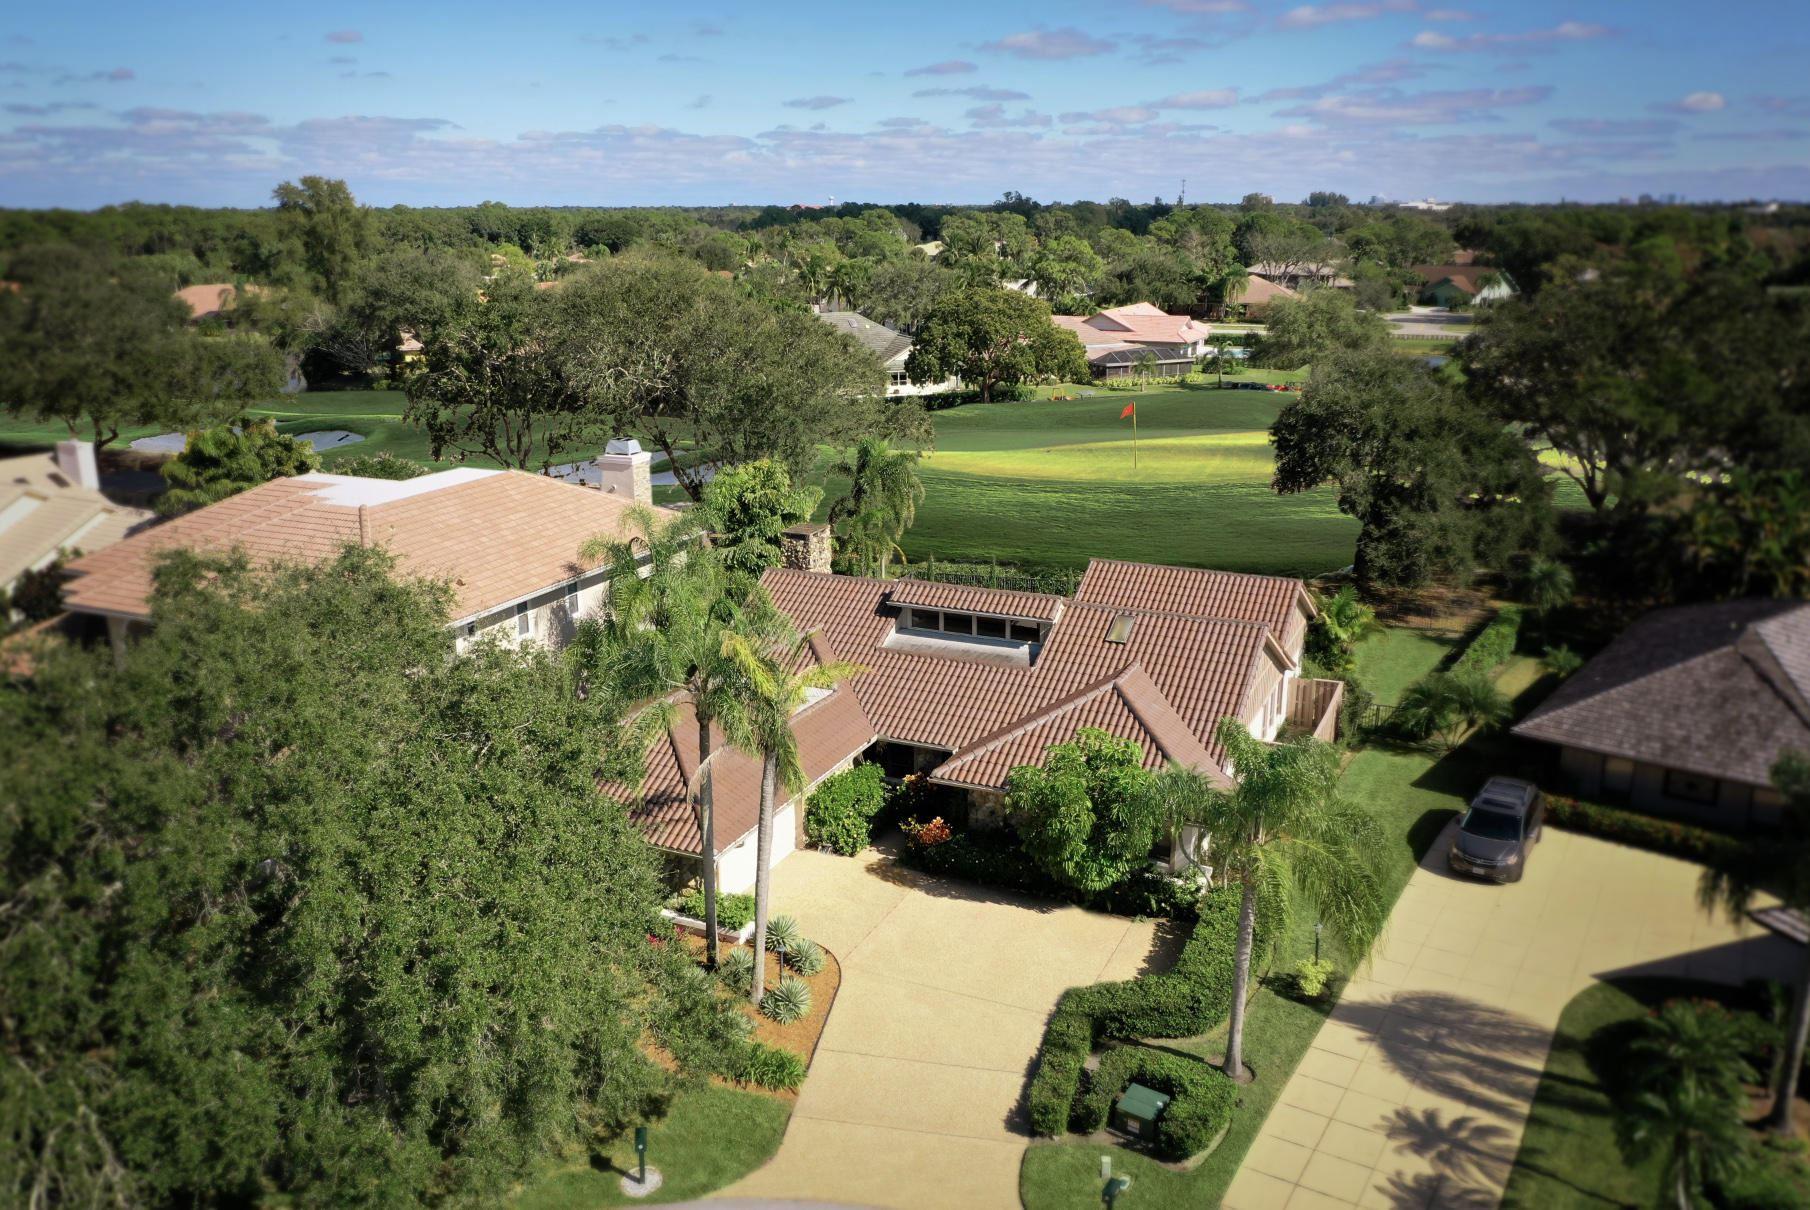 Photo of 4 Glencairn Court, Palm Beach Gardens, FL 33418 (MLS # RX-10679724)